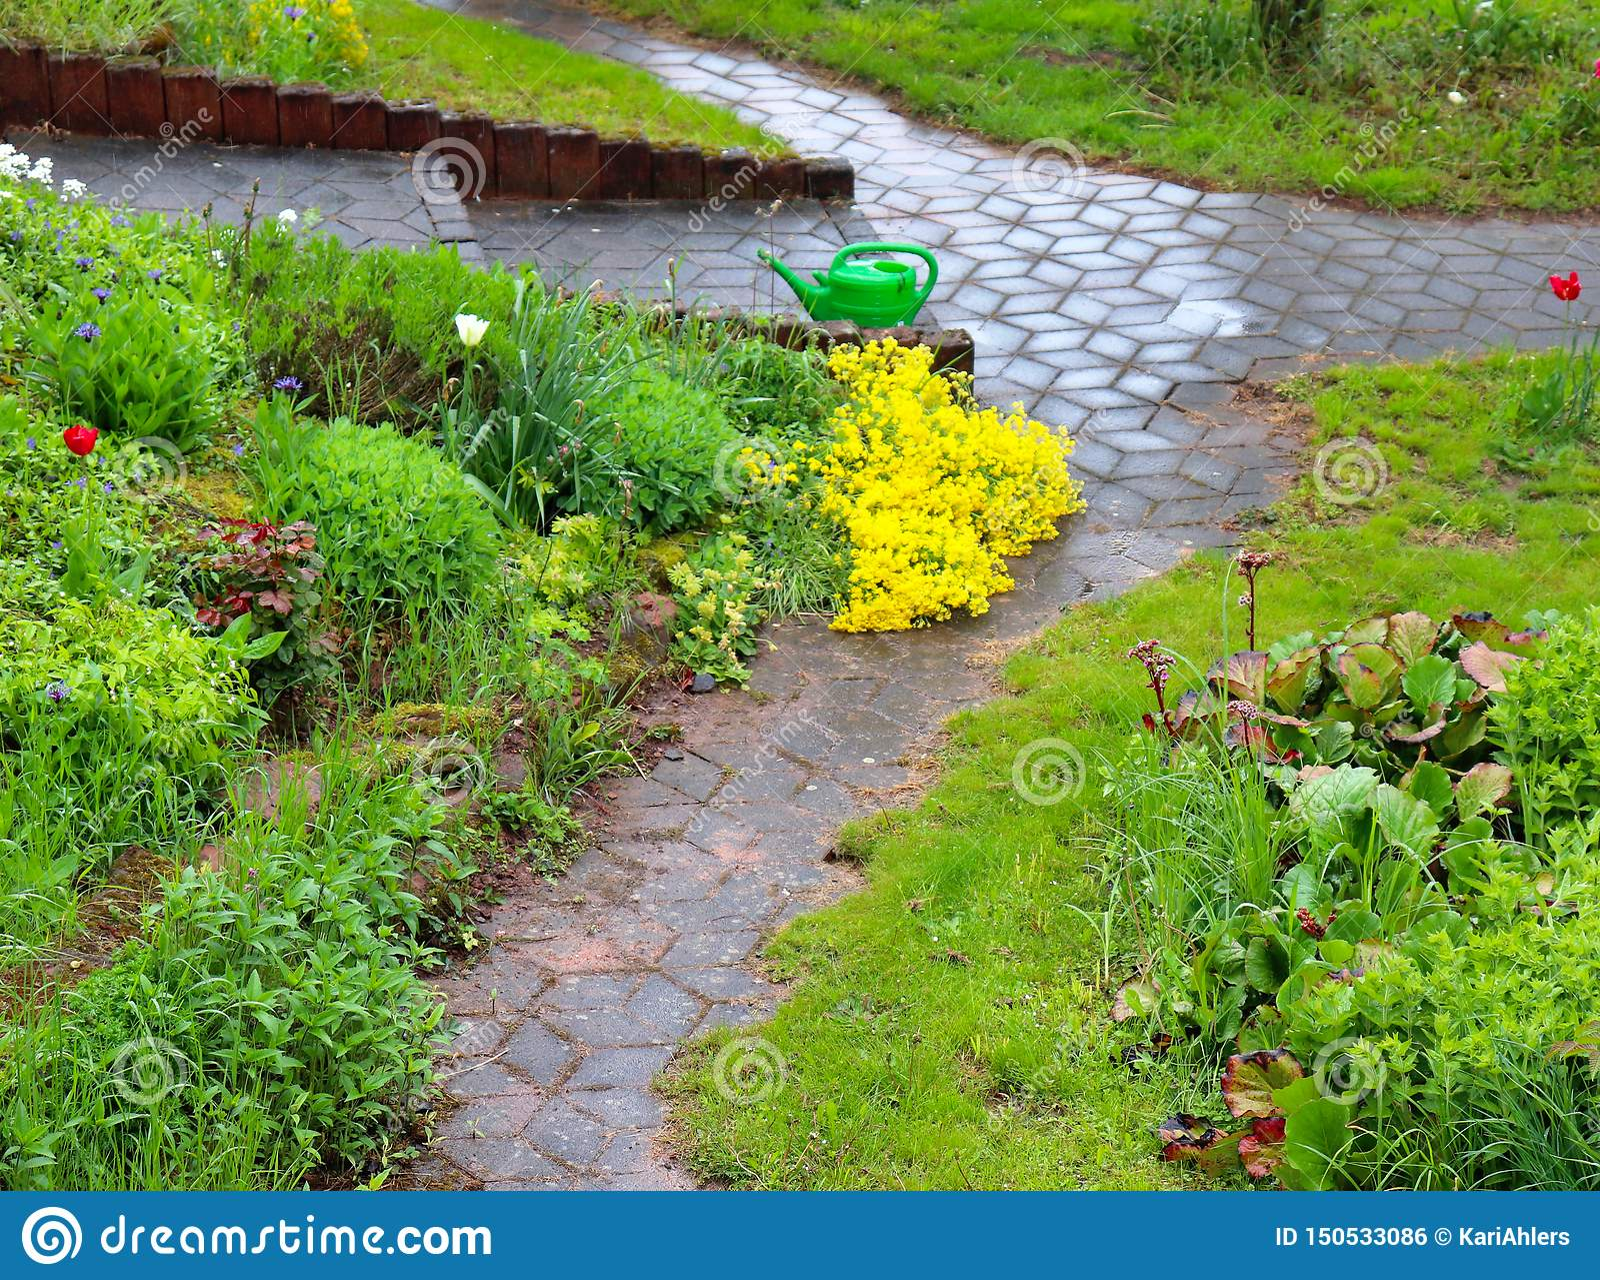 Spring rain storm in a garden in Germany